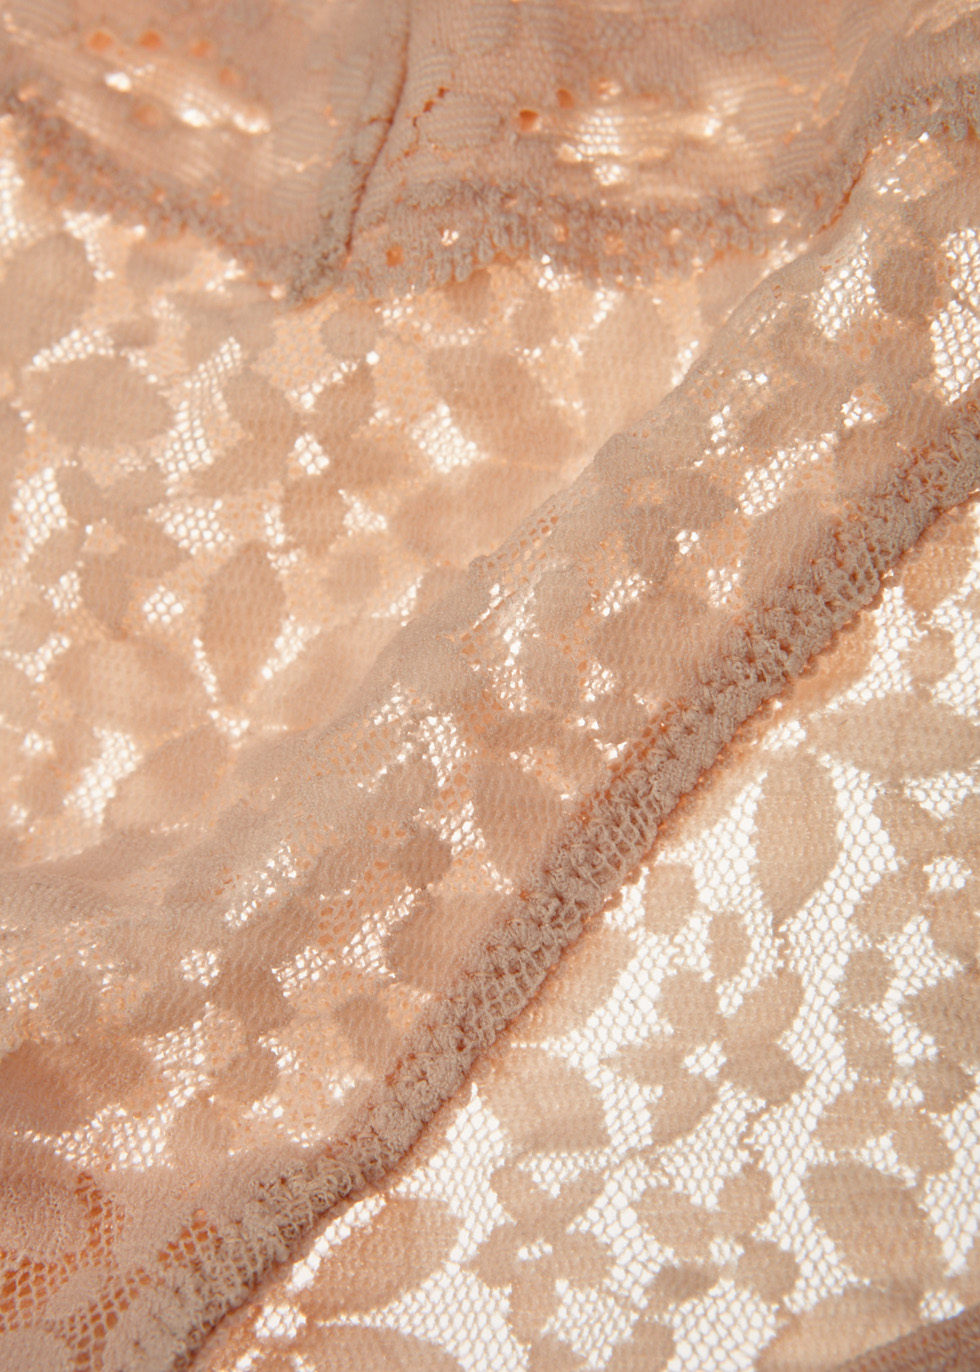 Halo blush lace briefs - Wacoal